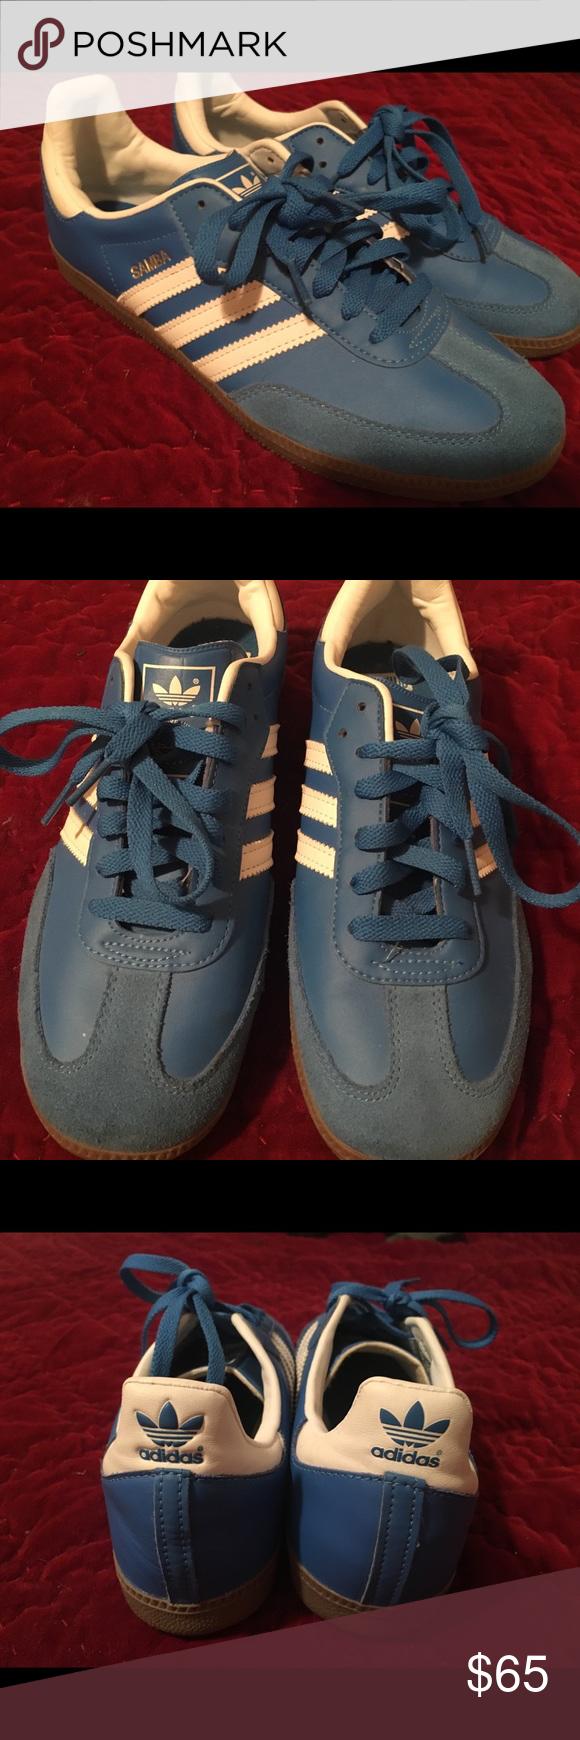 Scarpe Adidas Samba In Blu Brillante Adidas Samba Formatori In Bright